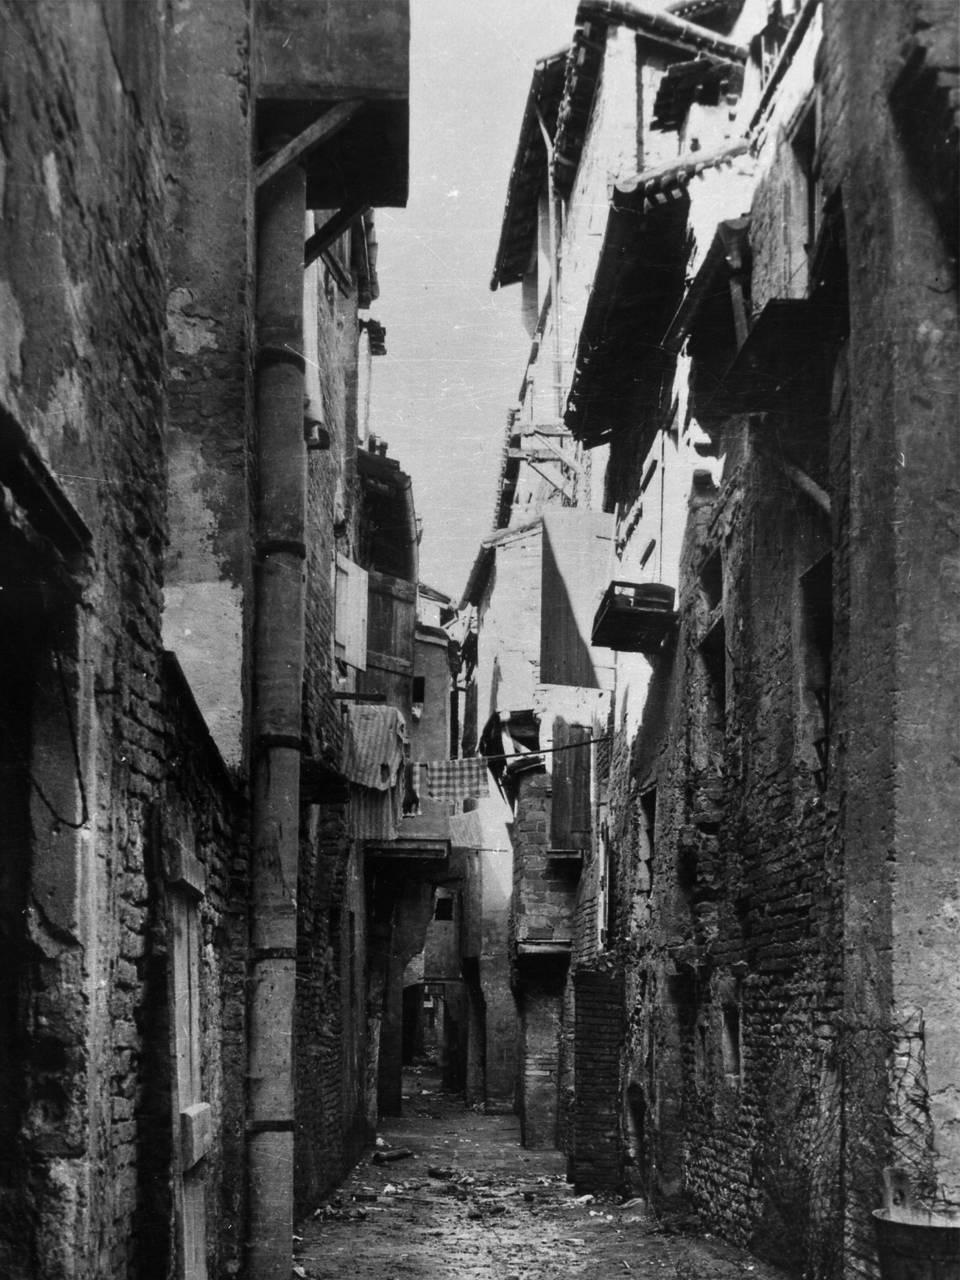 TRAVERSA BORGO EMILIO VIA FRANCOTETTO FOTOTECA BIBLIOTECA PANIZZI, FONDO IVANO BURANI - REGGIO EMILIA 1920 CA.